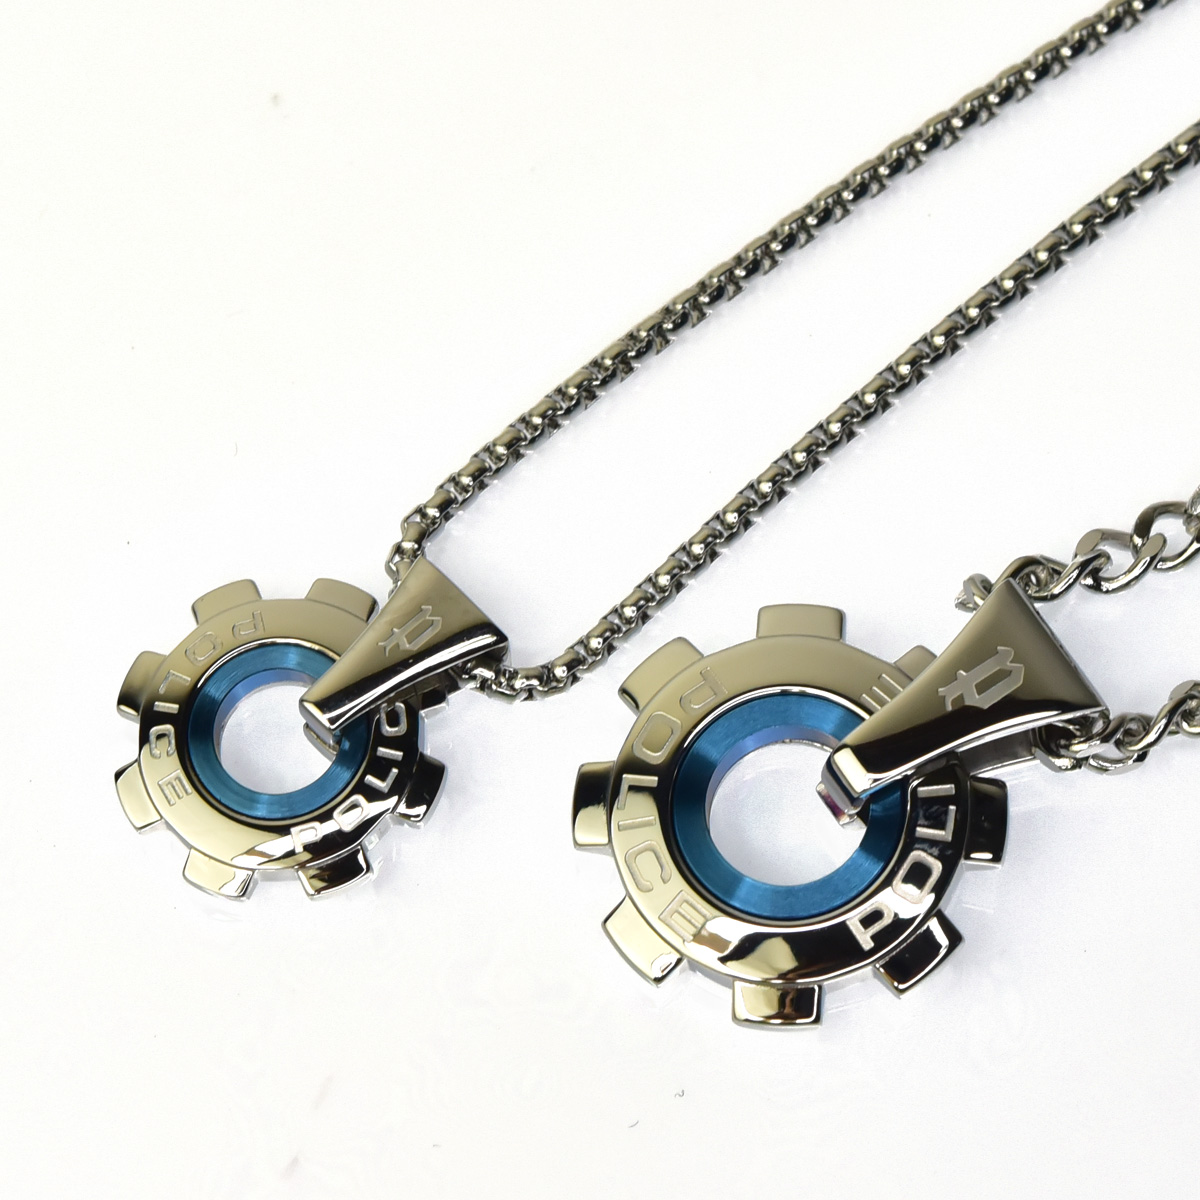 http://www.police.ne.jp/images/police_necklace_reactor_pea_01.jpg